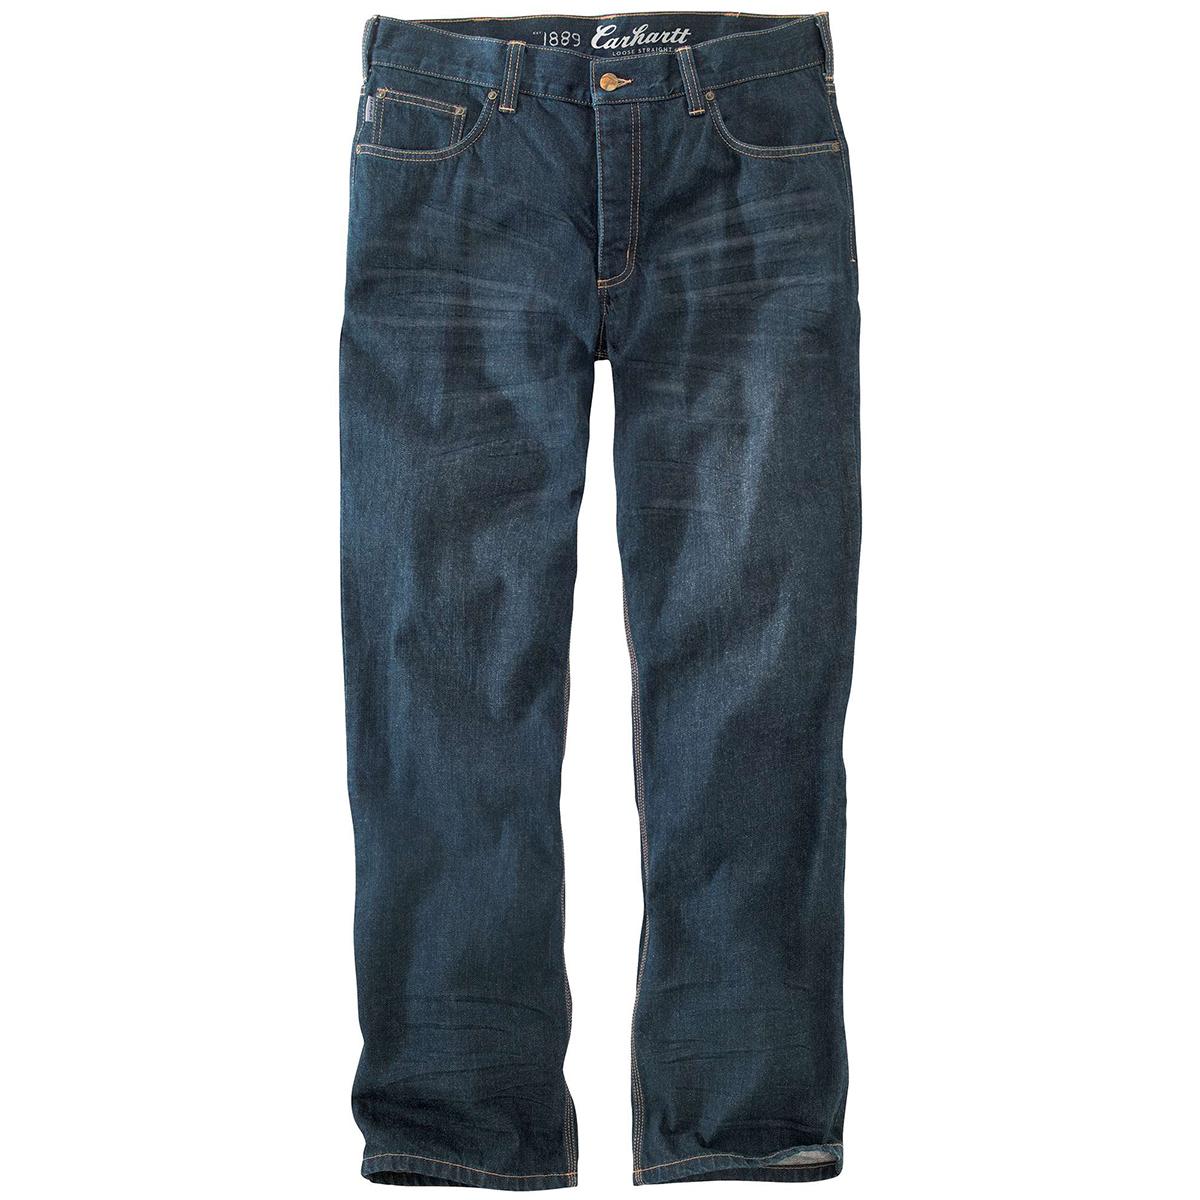 Carhartt Men's 101019 M 1889 Loose Straight Jeans - Blue, 36/32